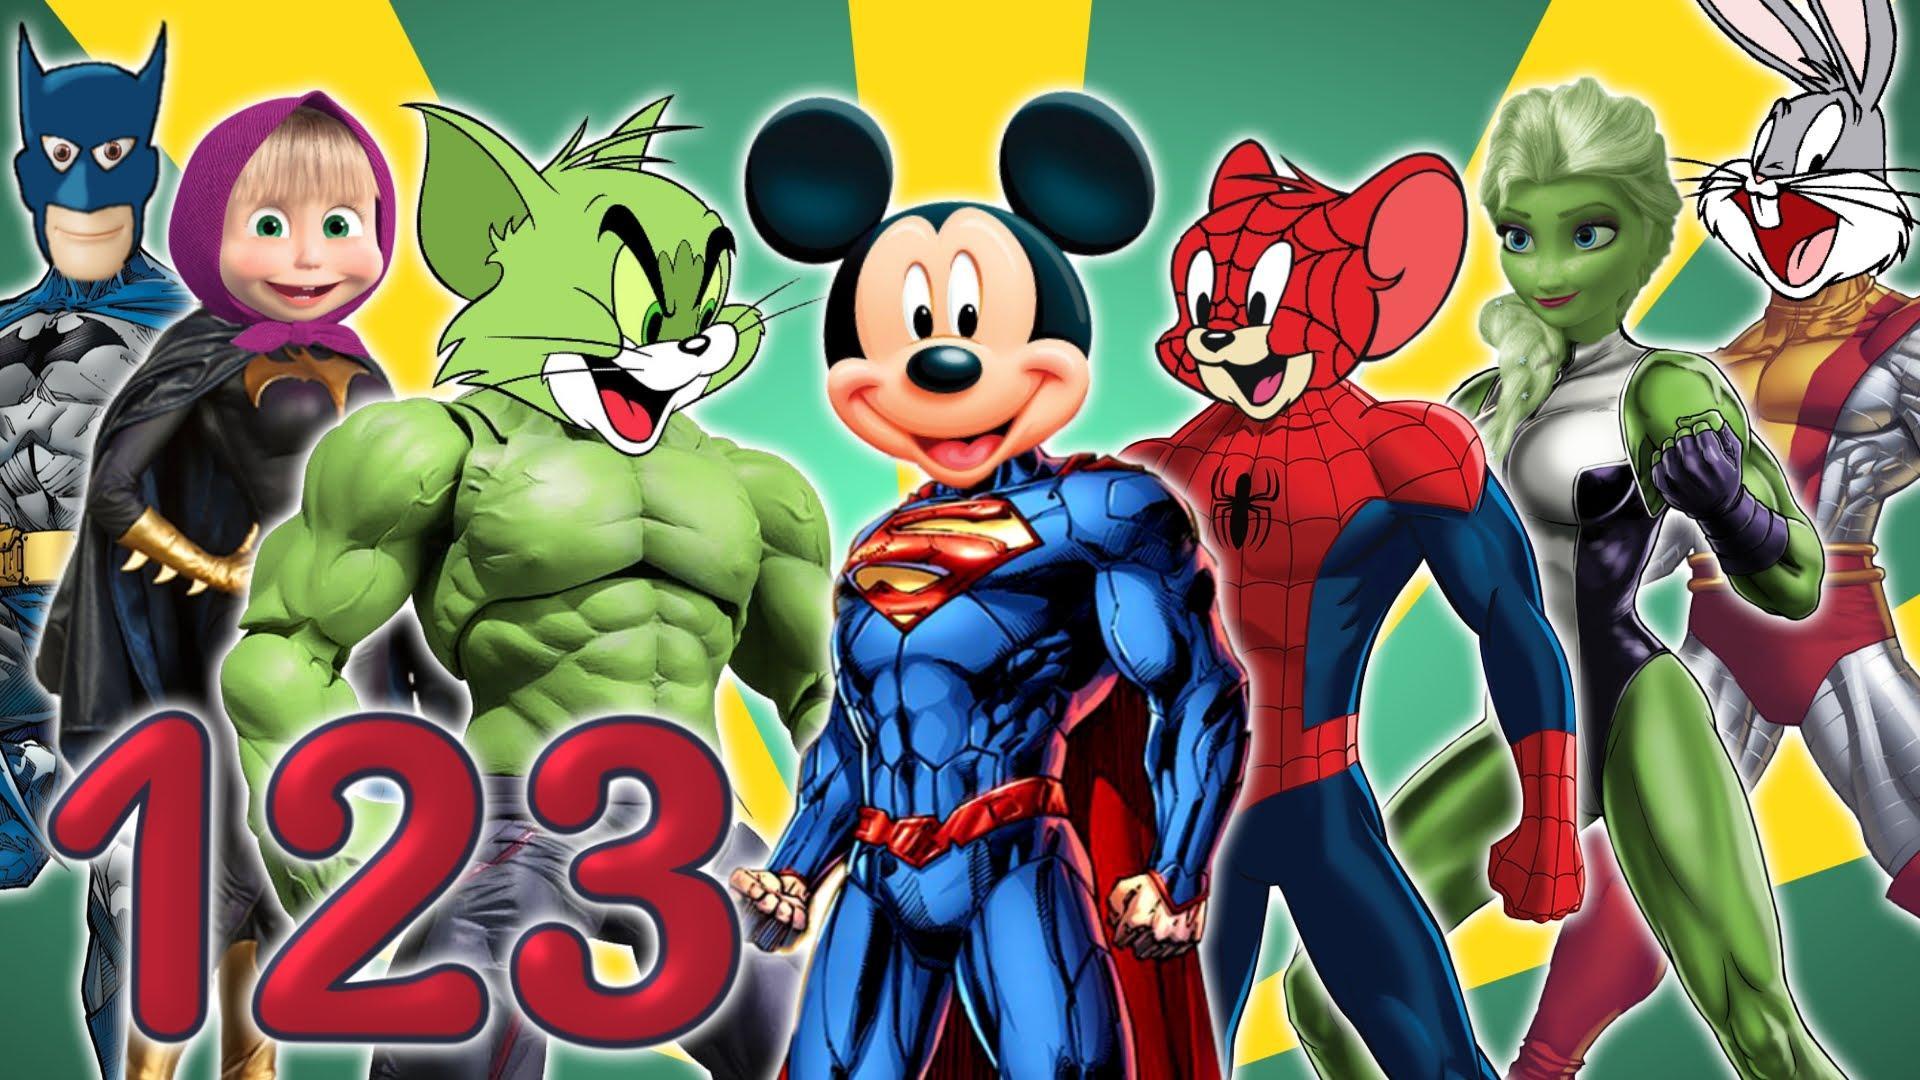 Superheroes Cartoon Wallpapers - Wallpaper Cave